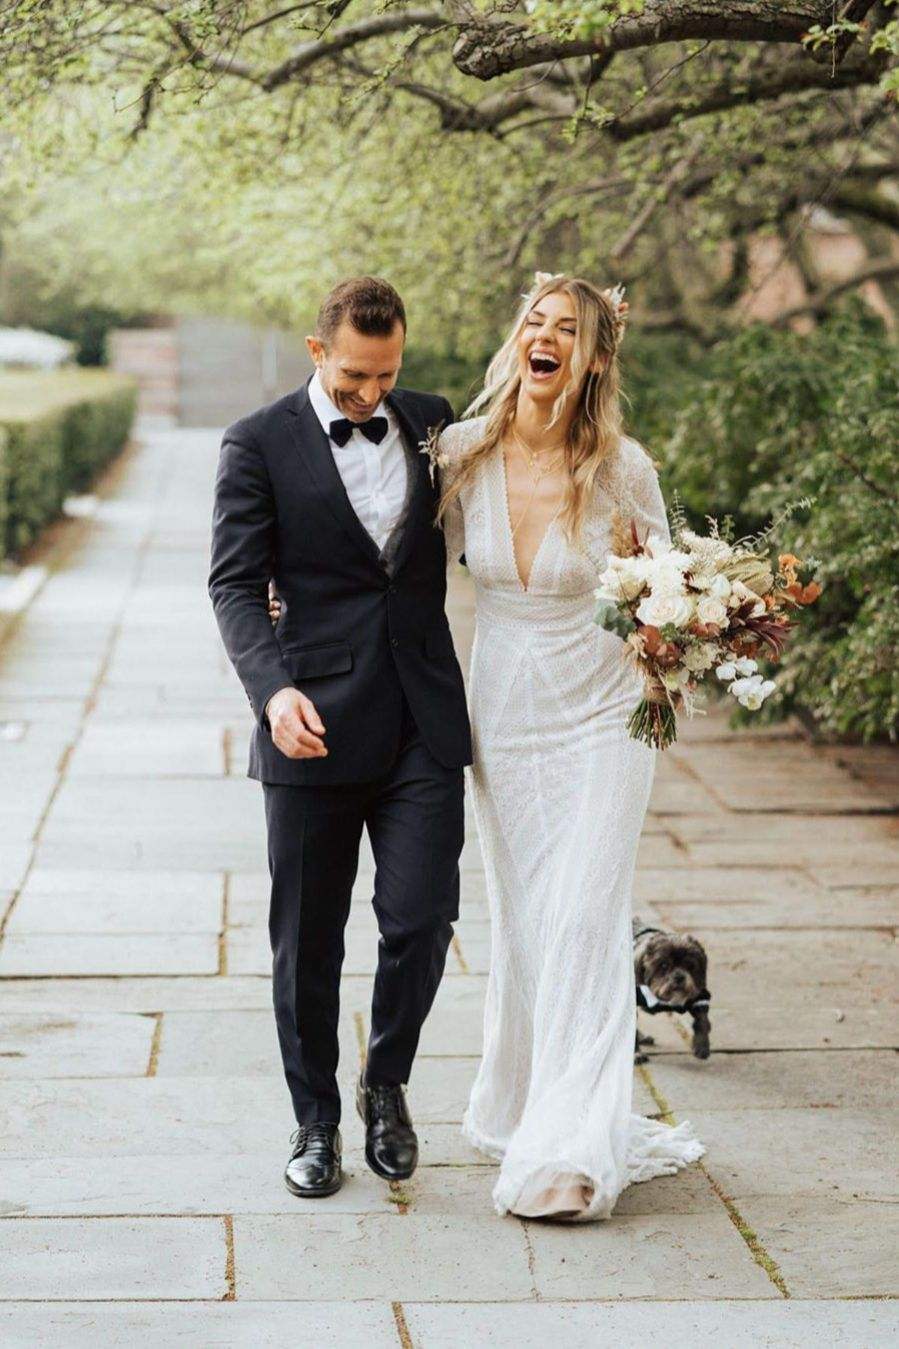 Summer Gown From Bhldn Modest Wedding Dresses Ball Gown Column Wedding Dress Modest Wedding Dresses [ 1349 x 899 Pixel ]